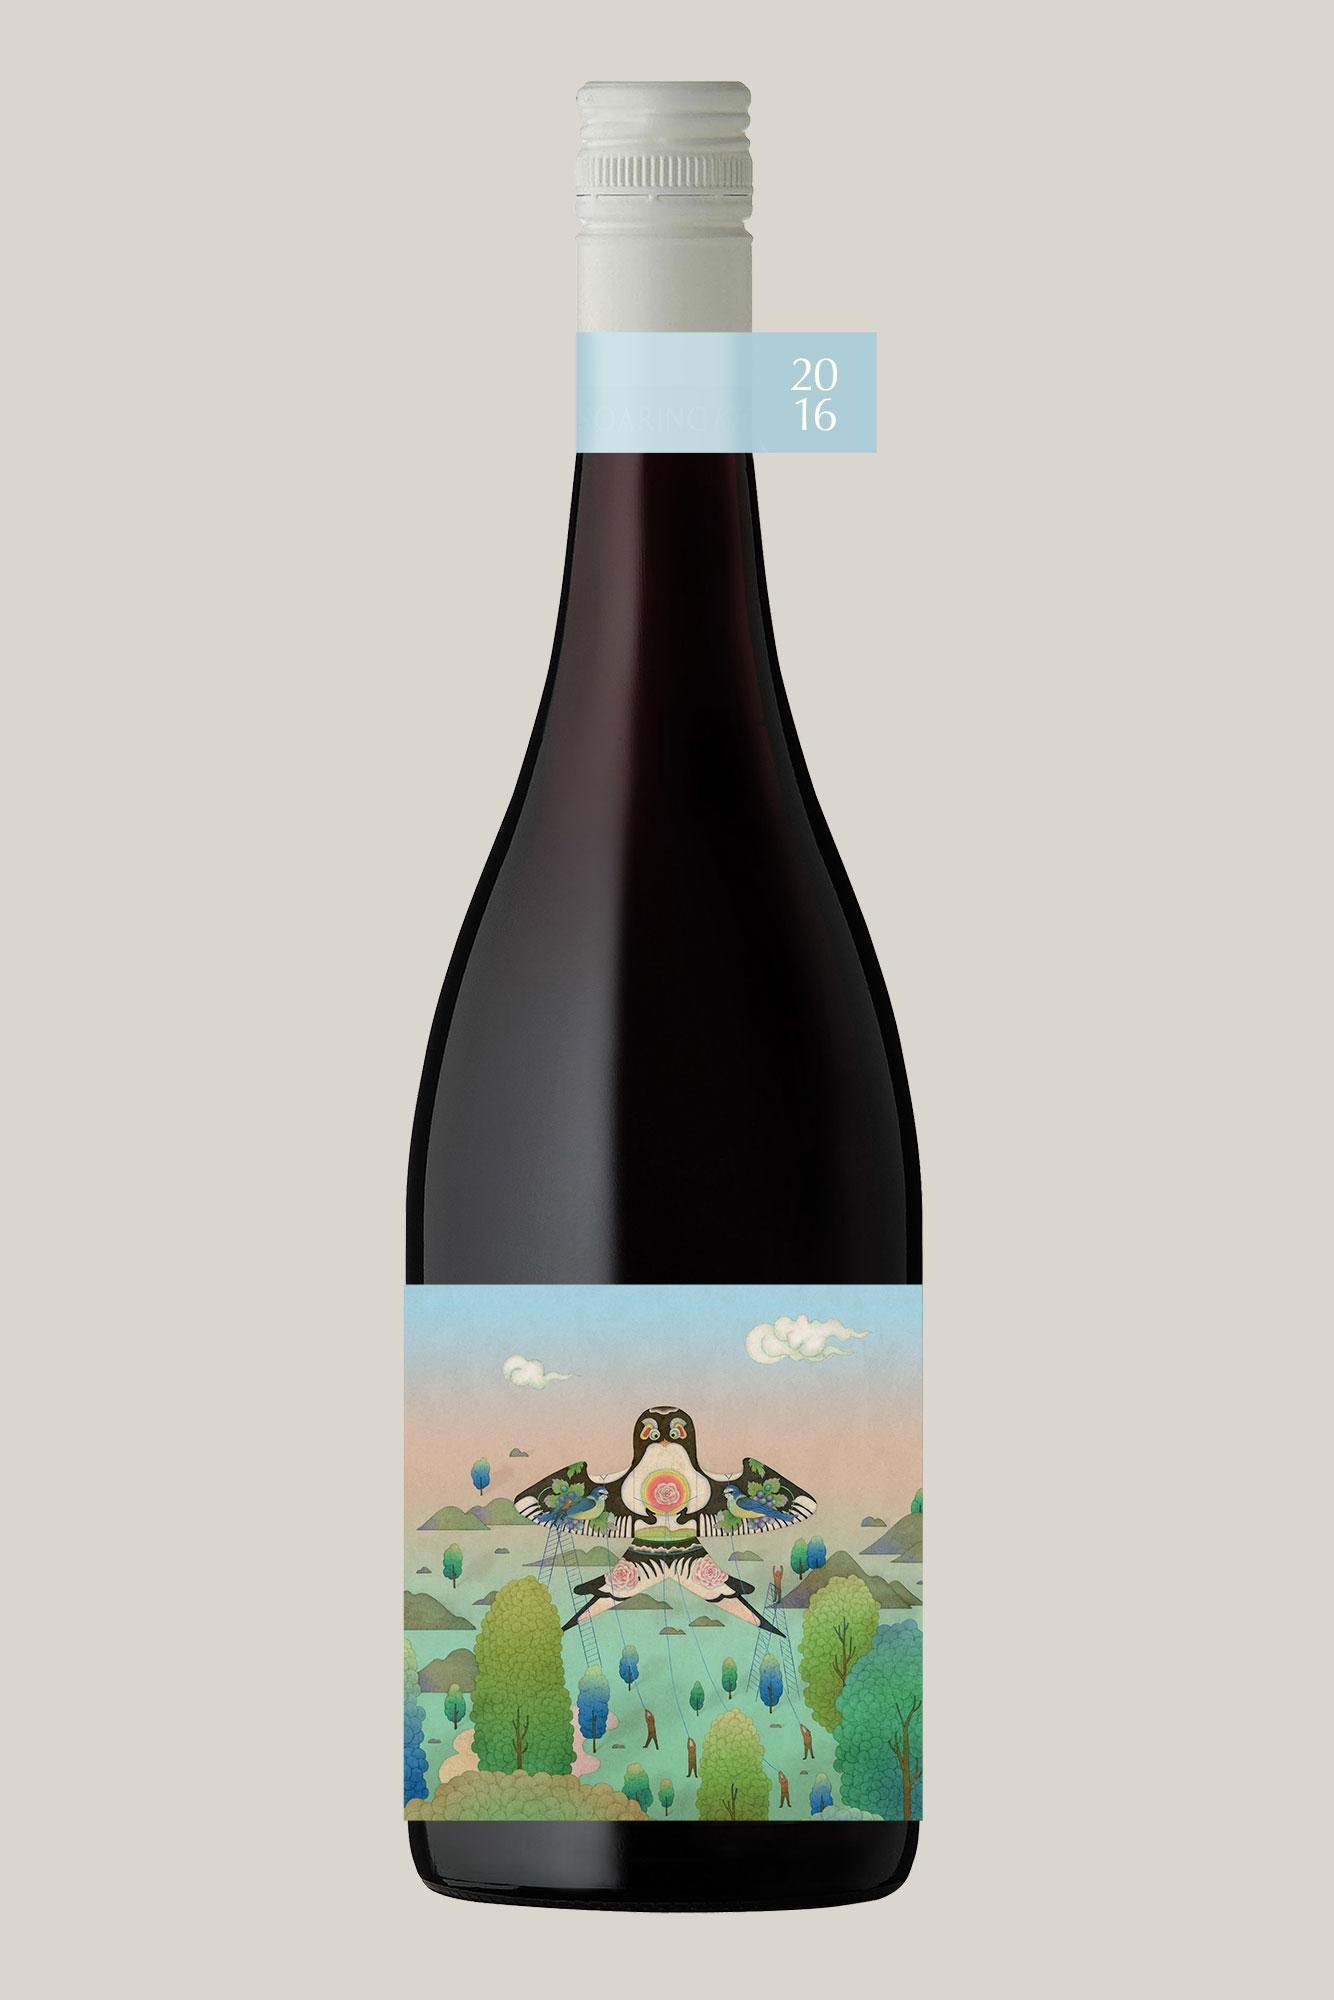 Soaring Kite 2016 Shiraz Wine Bottle